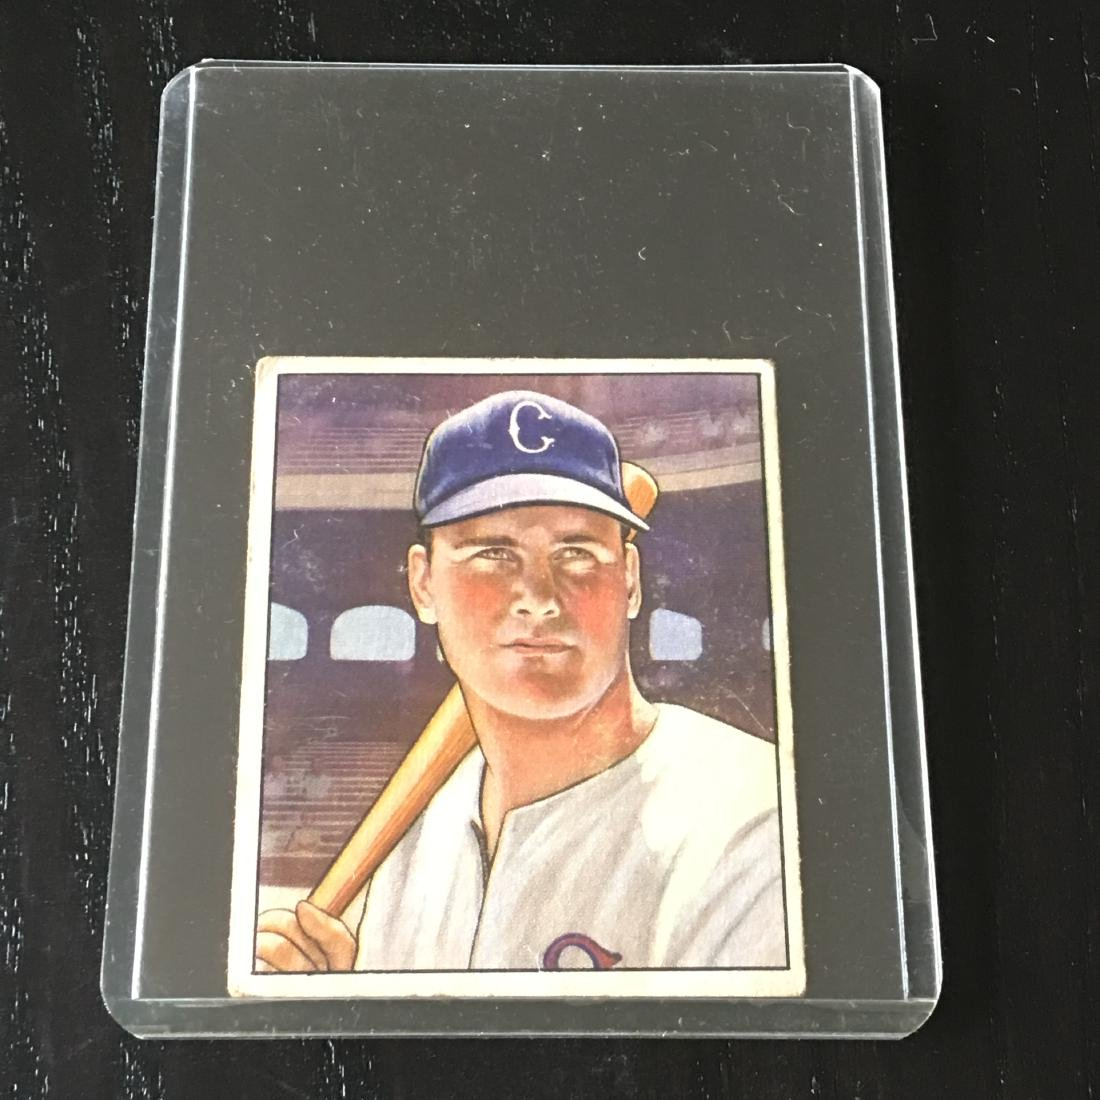 1950 Bowman Baseball Card Gus Zernial 4 Mar 17 2019 Petruccos